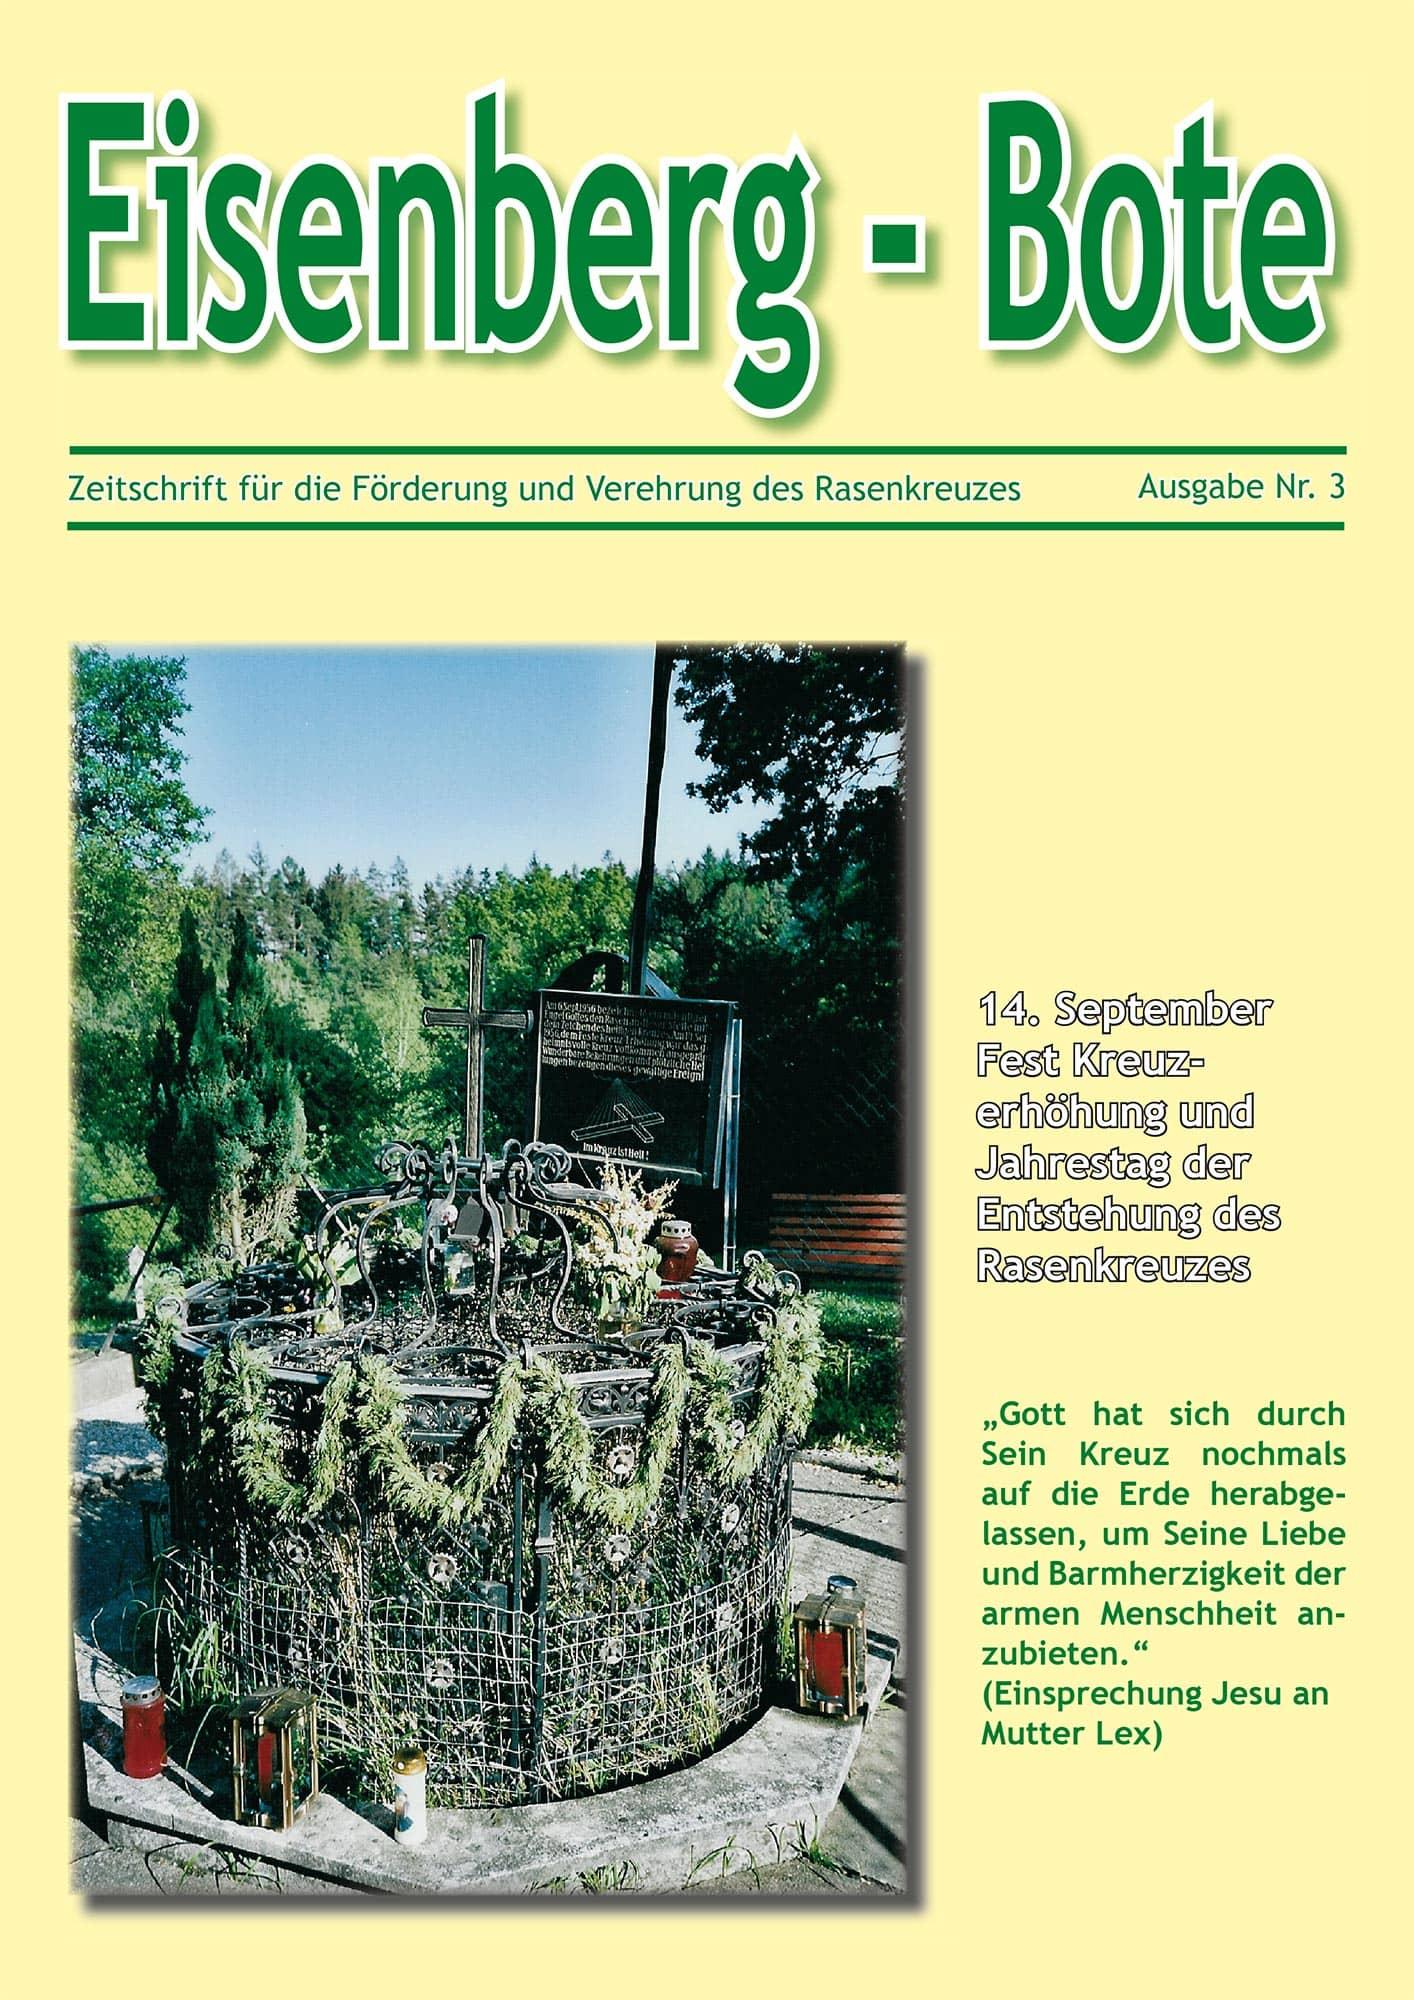 Eisenberg_bote_03